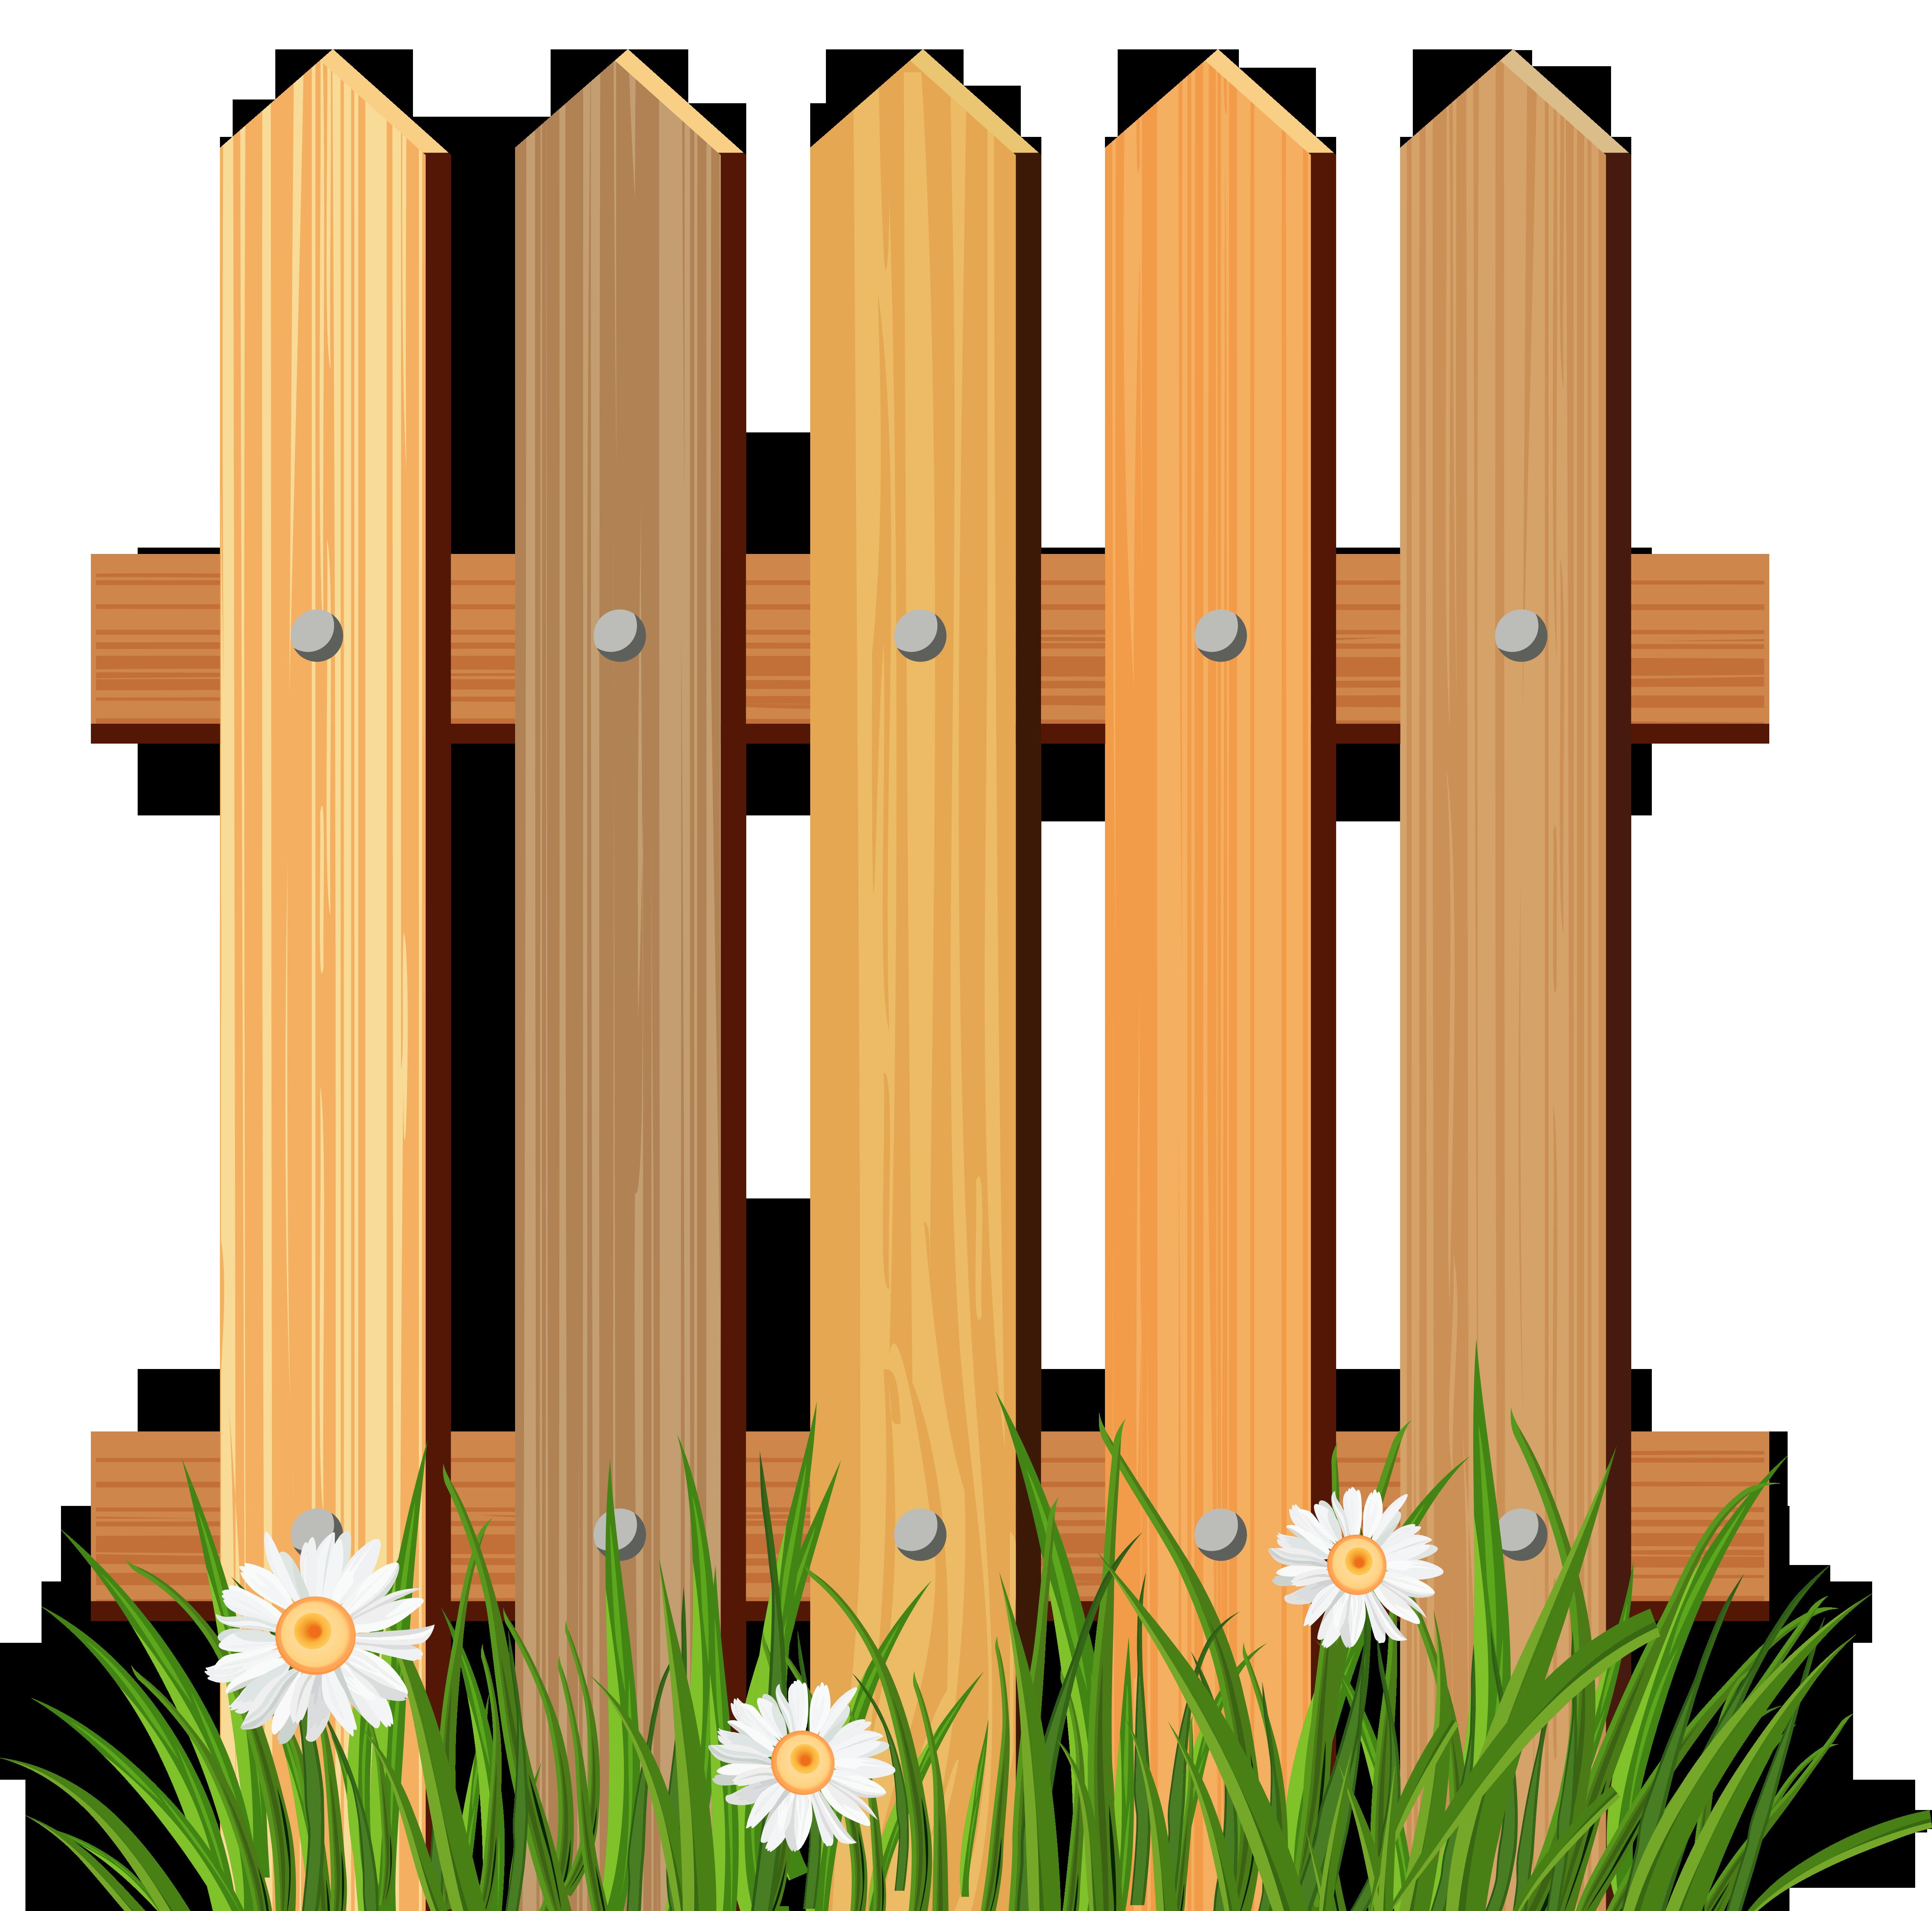 5165x5109 Wooden Garden Fence Clipart